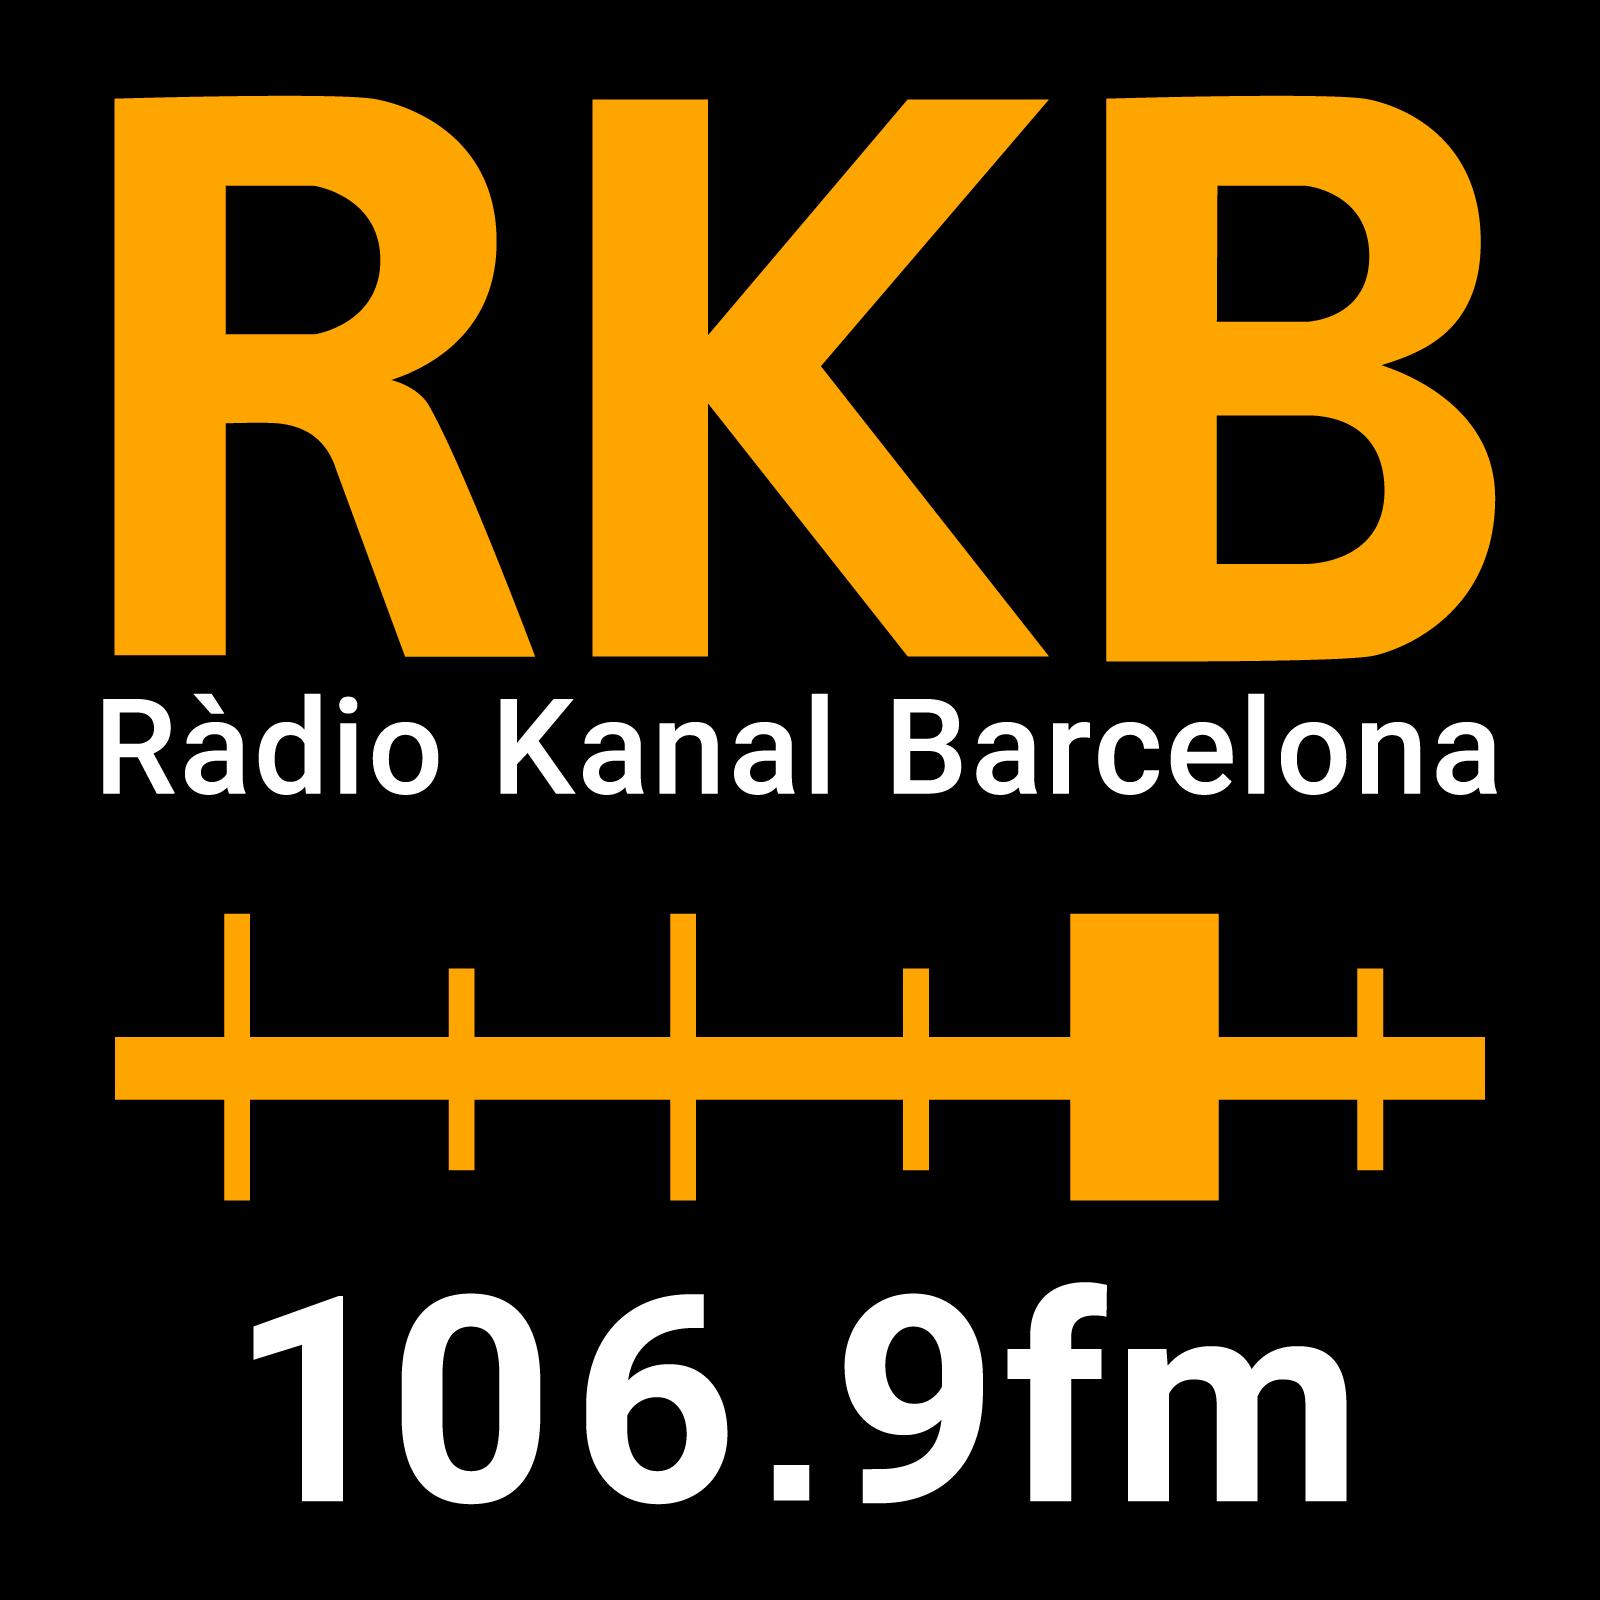 radio kanal barcelona